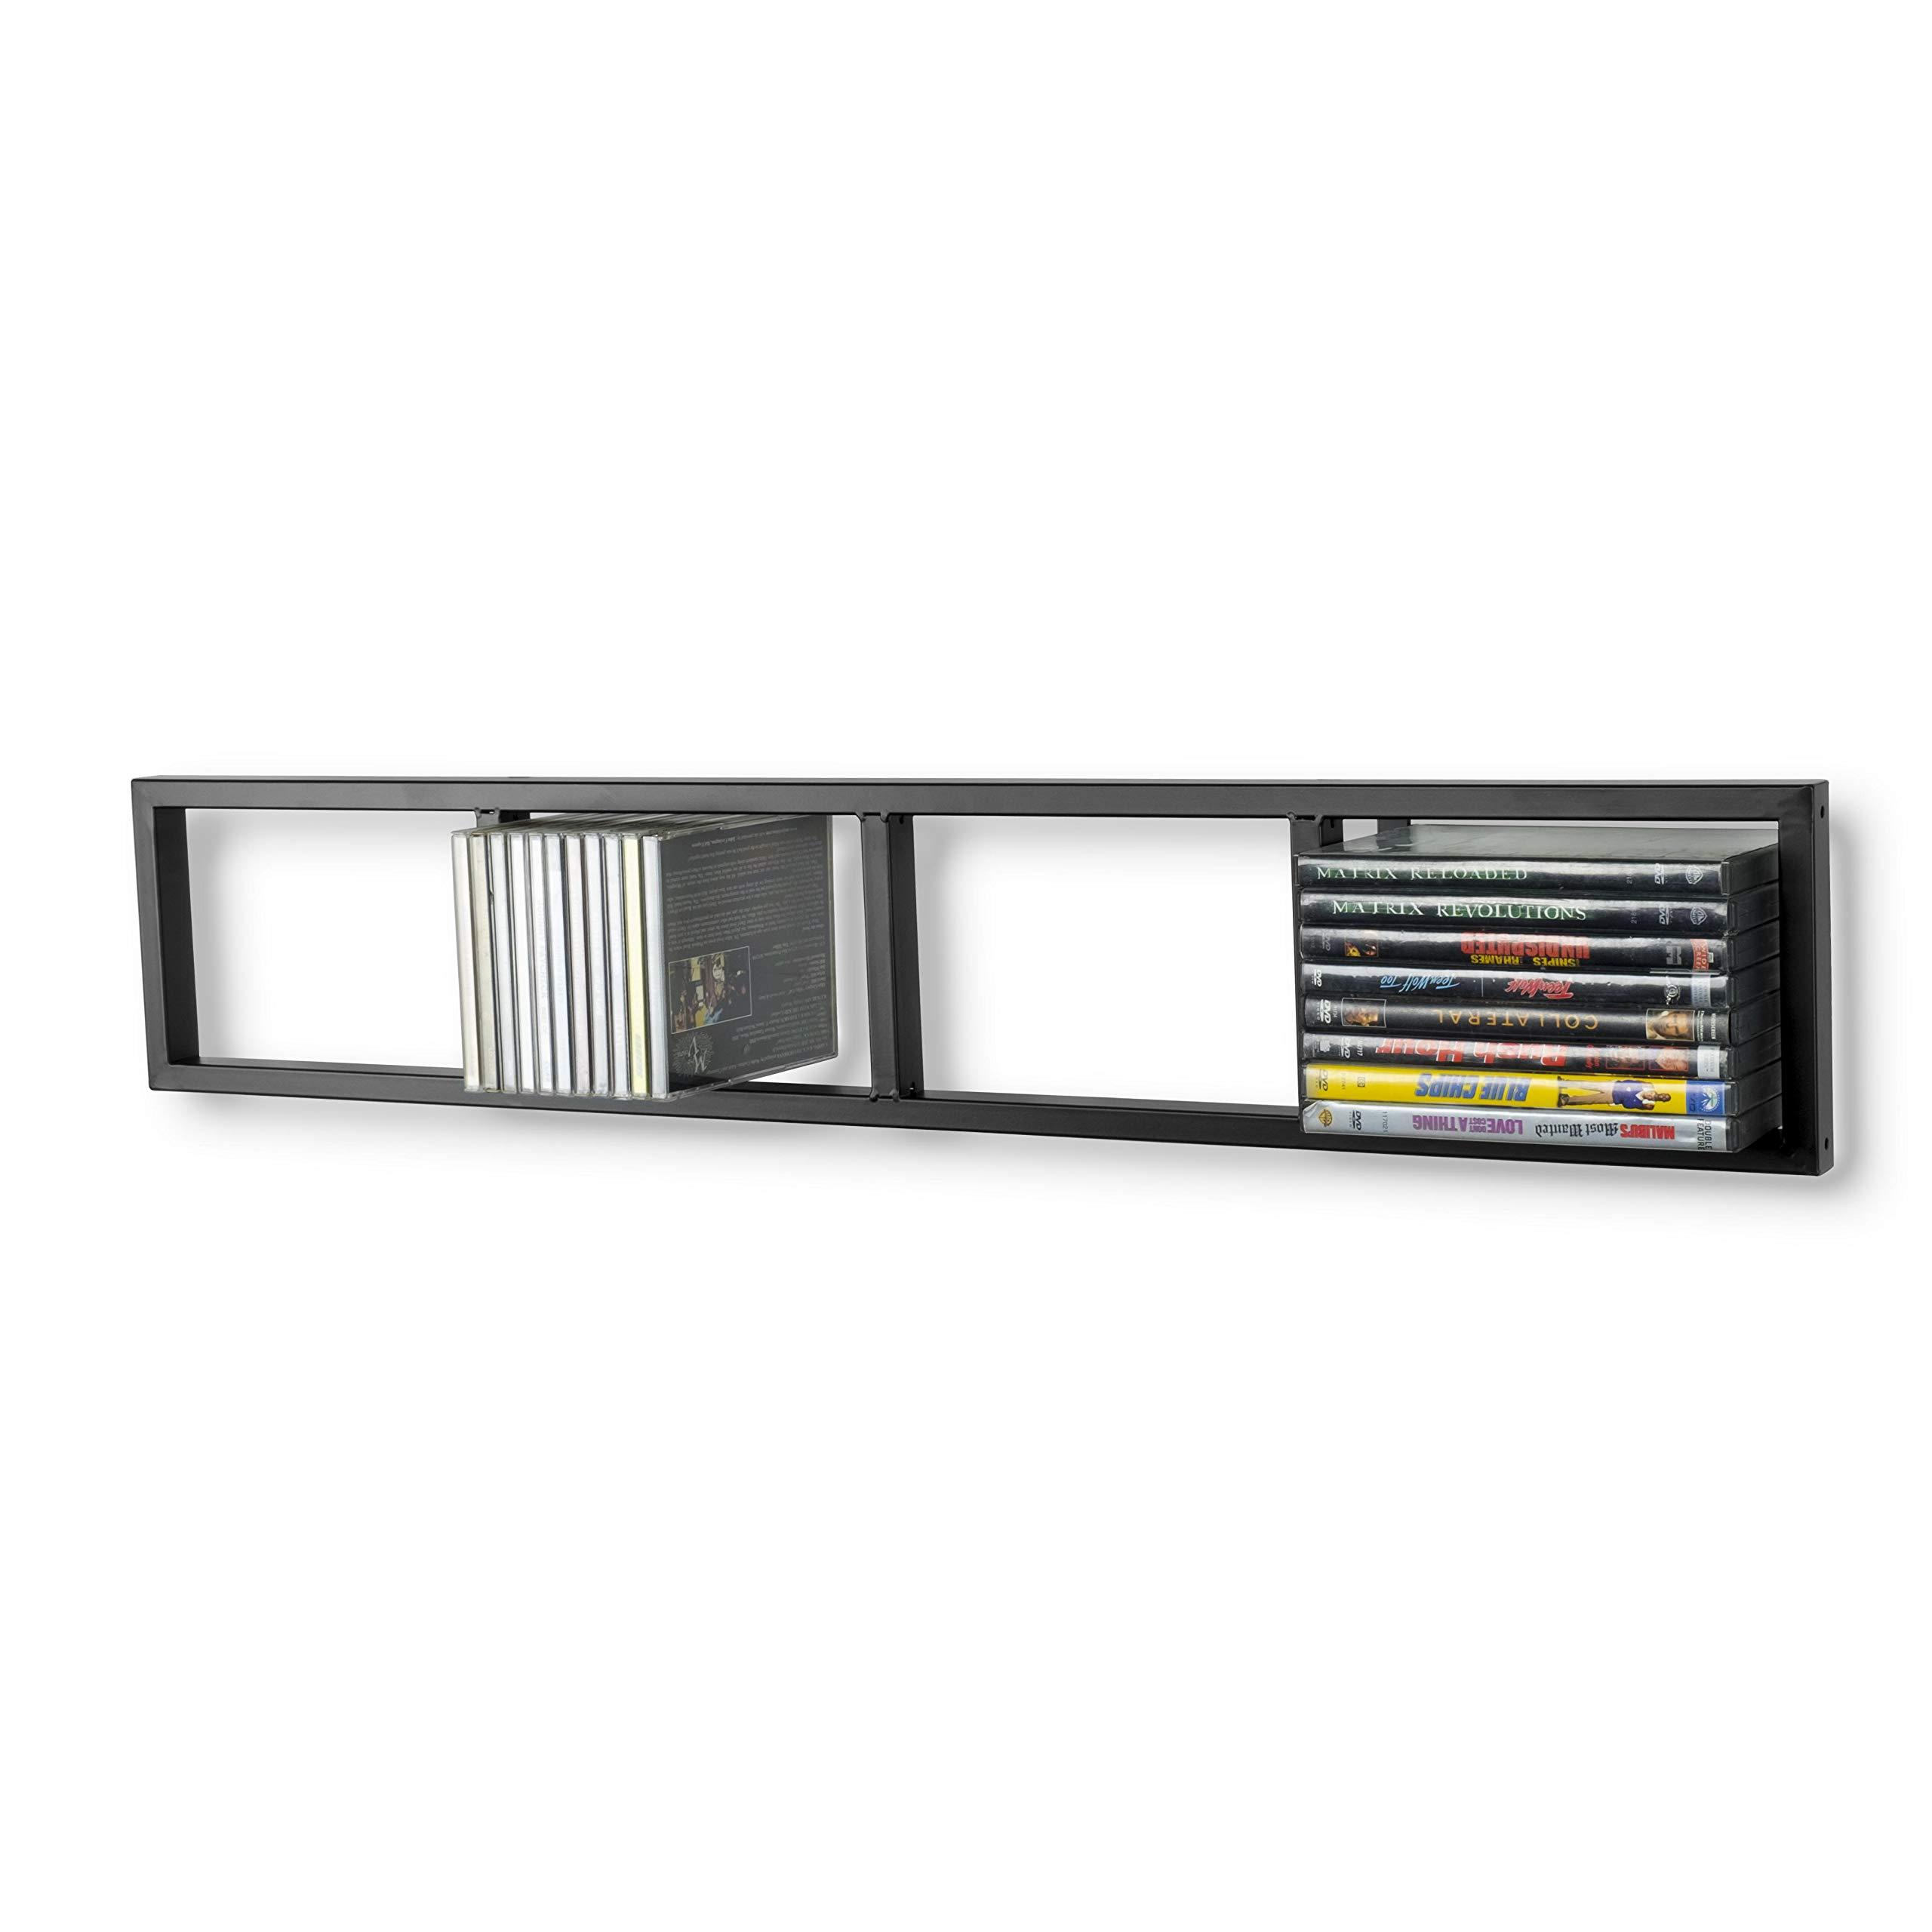 Modern Wall Mount Cd DVD Media Rack Storage Metal Shelf Organizer (Black) by BHG